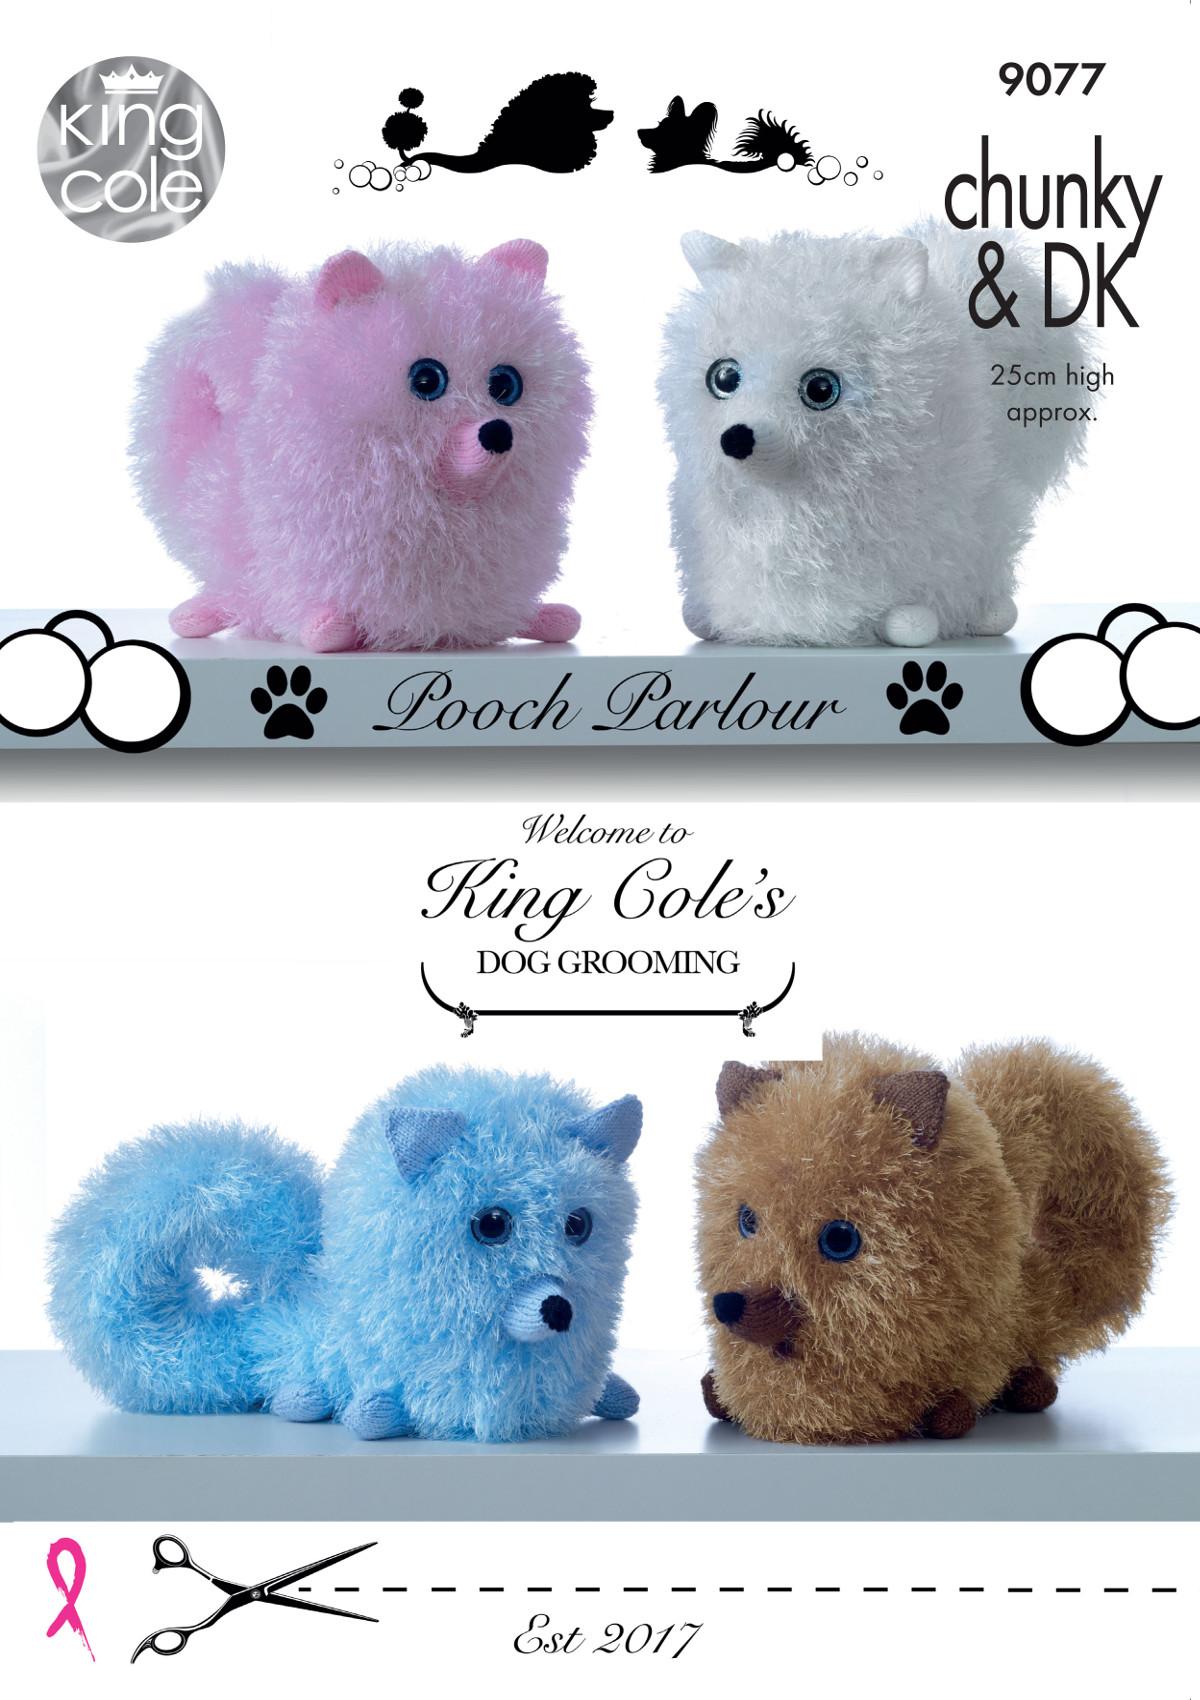 King Cole Tinsel Chunky DK Knitting Pattern Pomeranian Dogs Pooch ...